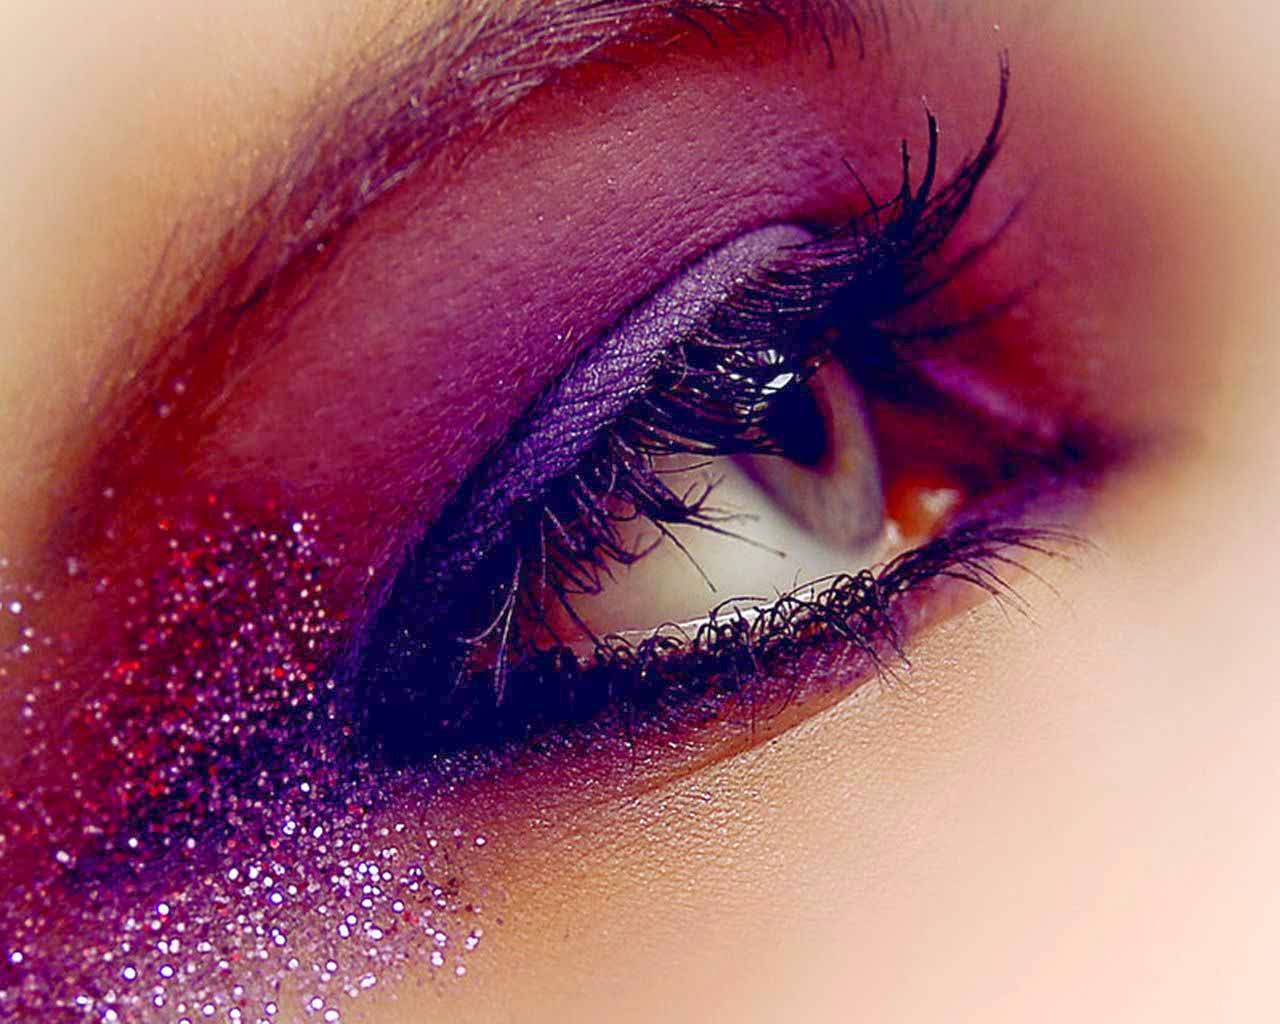 Eyes Makeup Wallpapers | Full Widescreen Desktop Wallpapers | Cool HD Wallpapers For PC